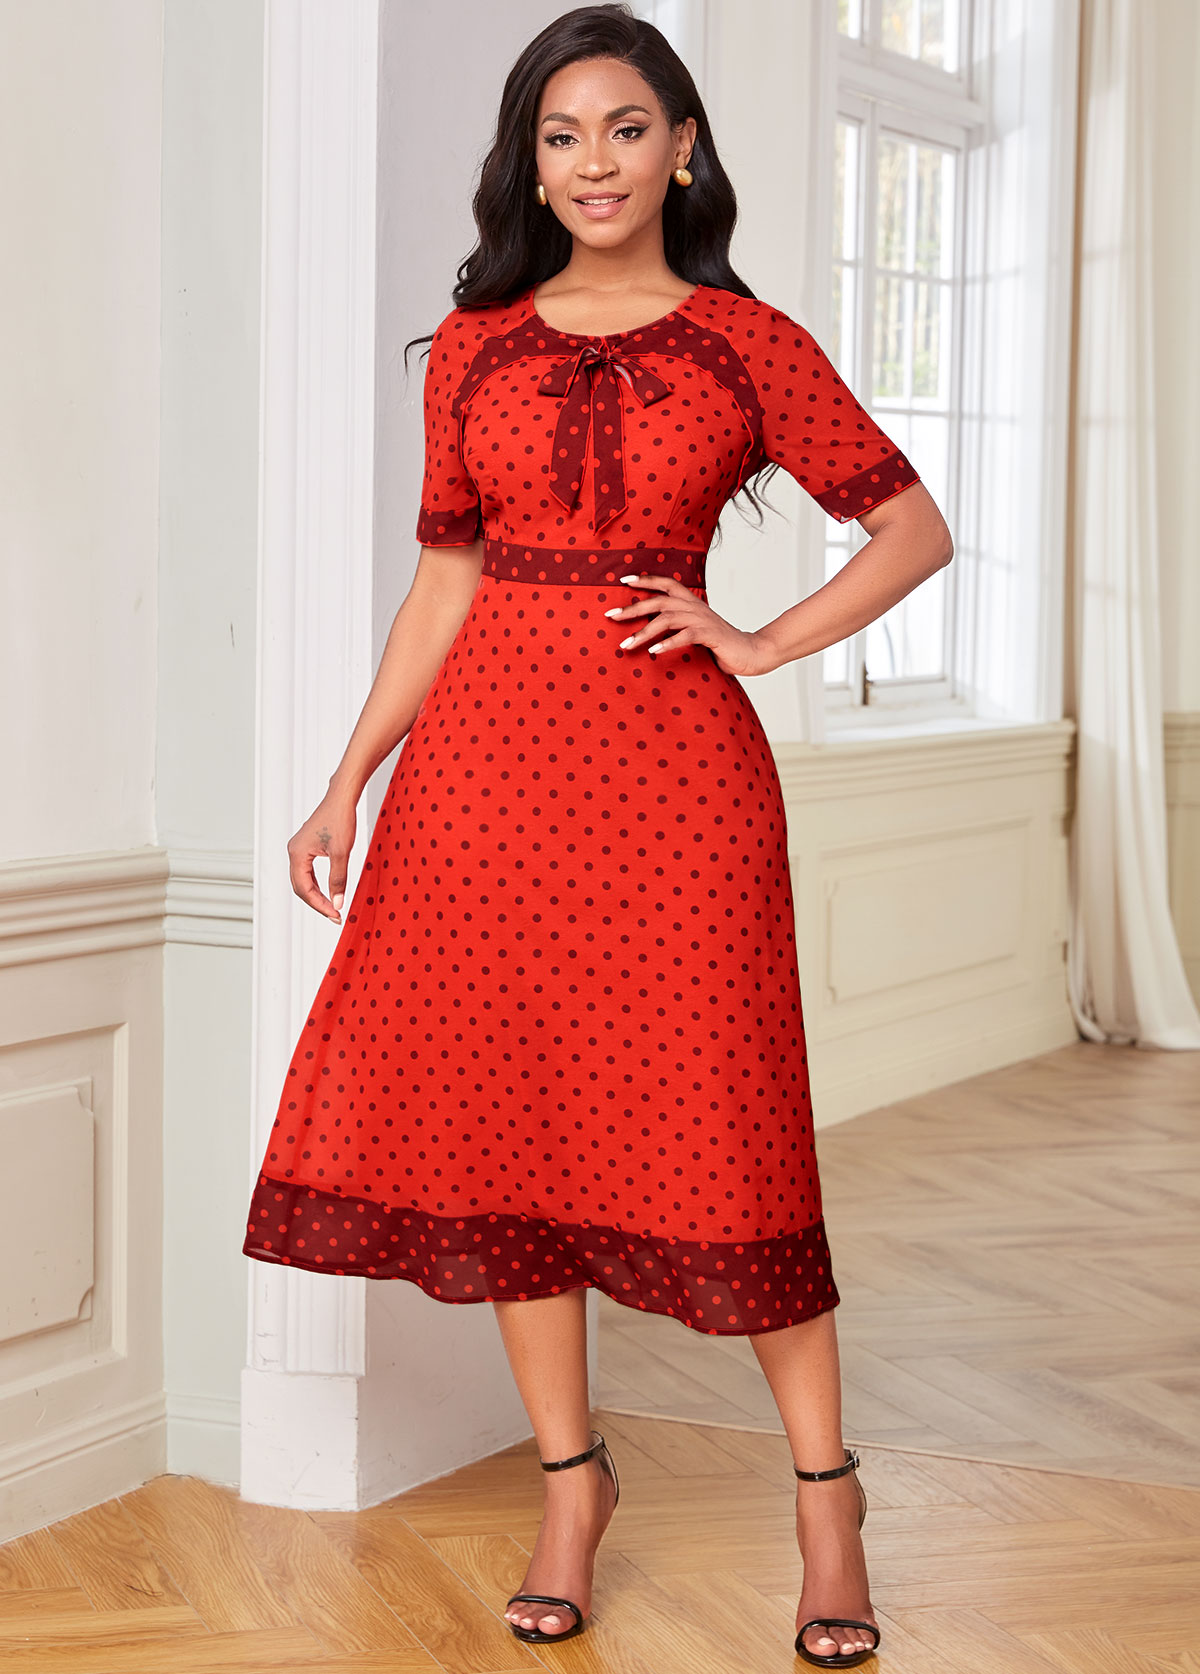 Polka Dot Short Sleeve Bowknot Dress